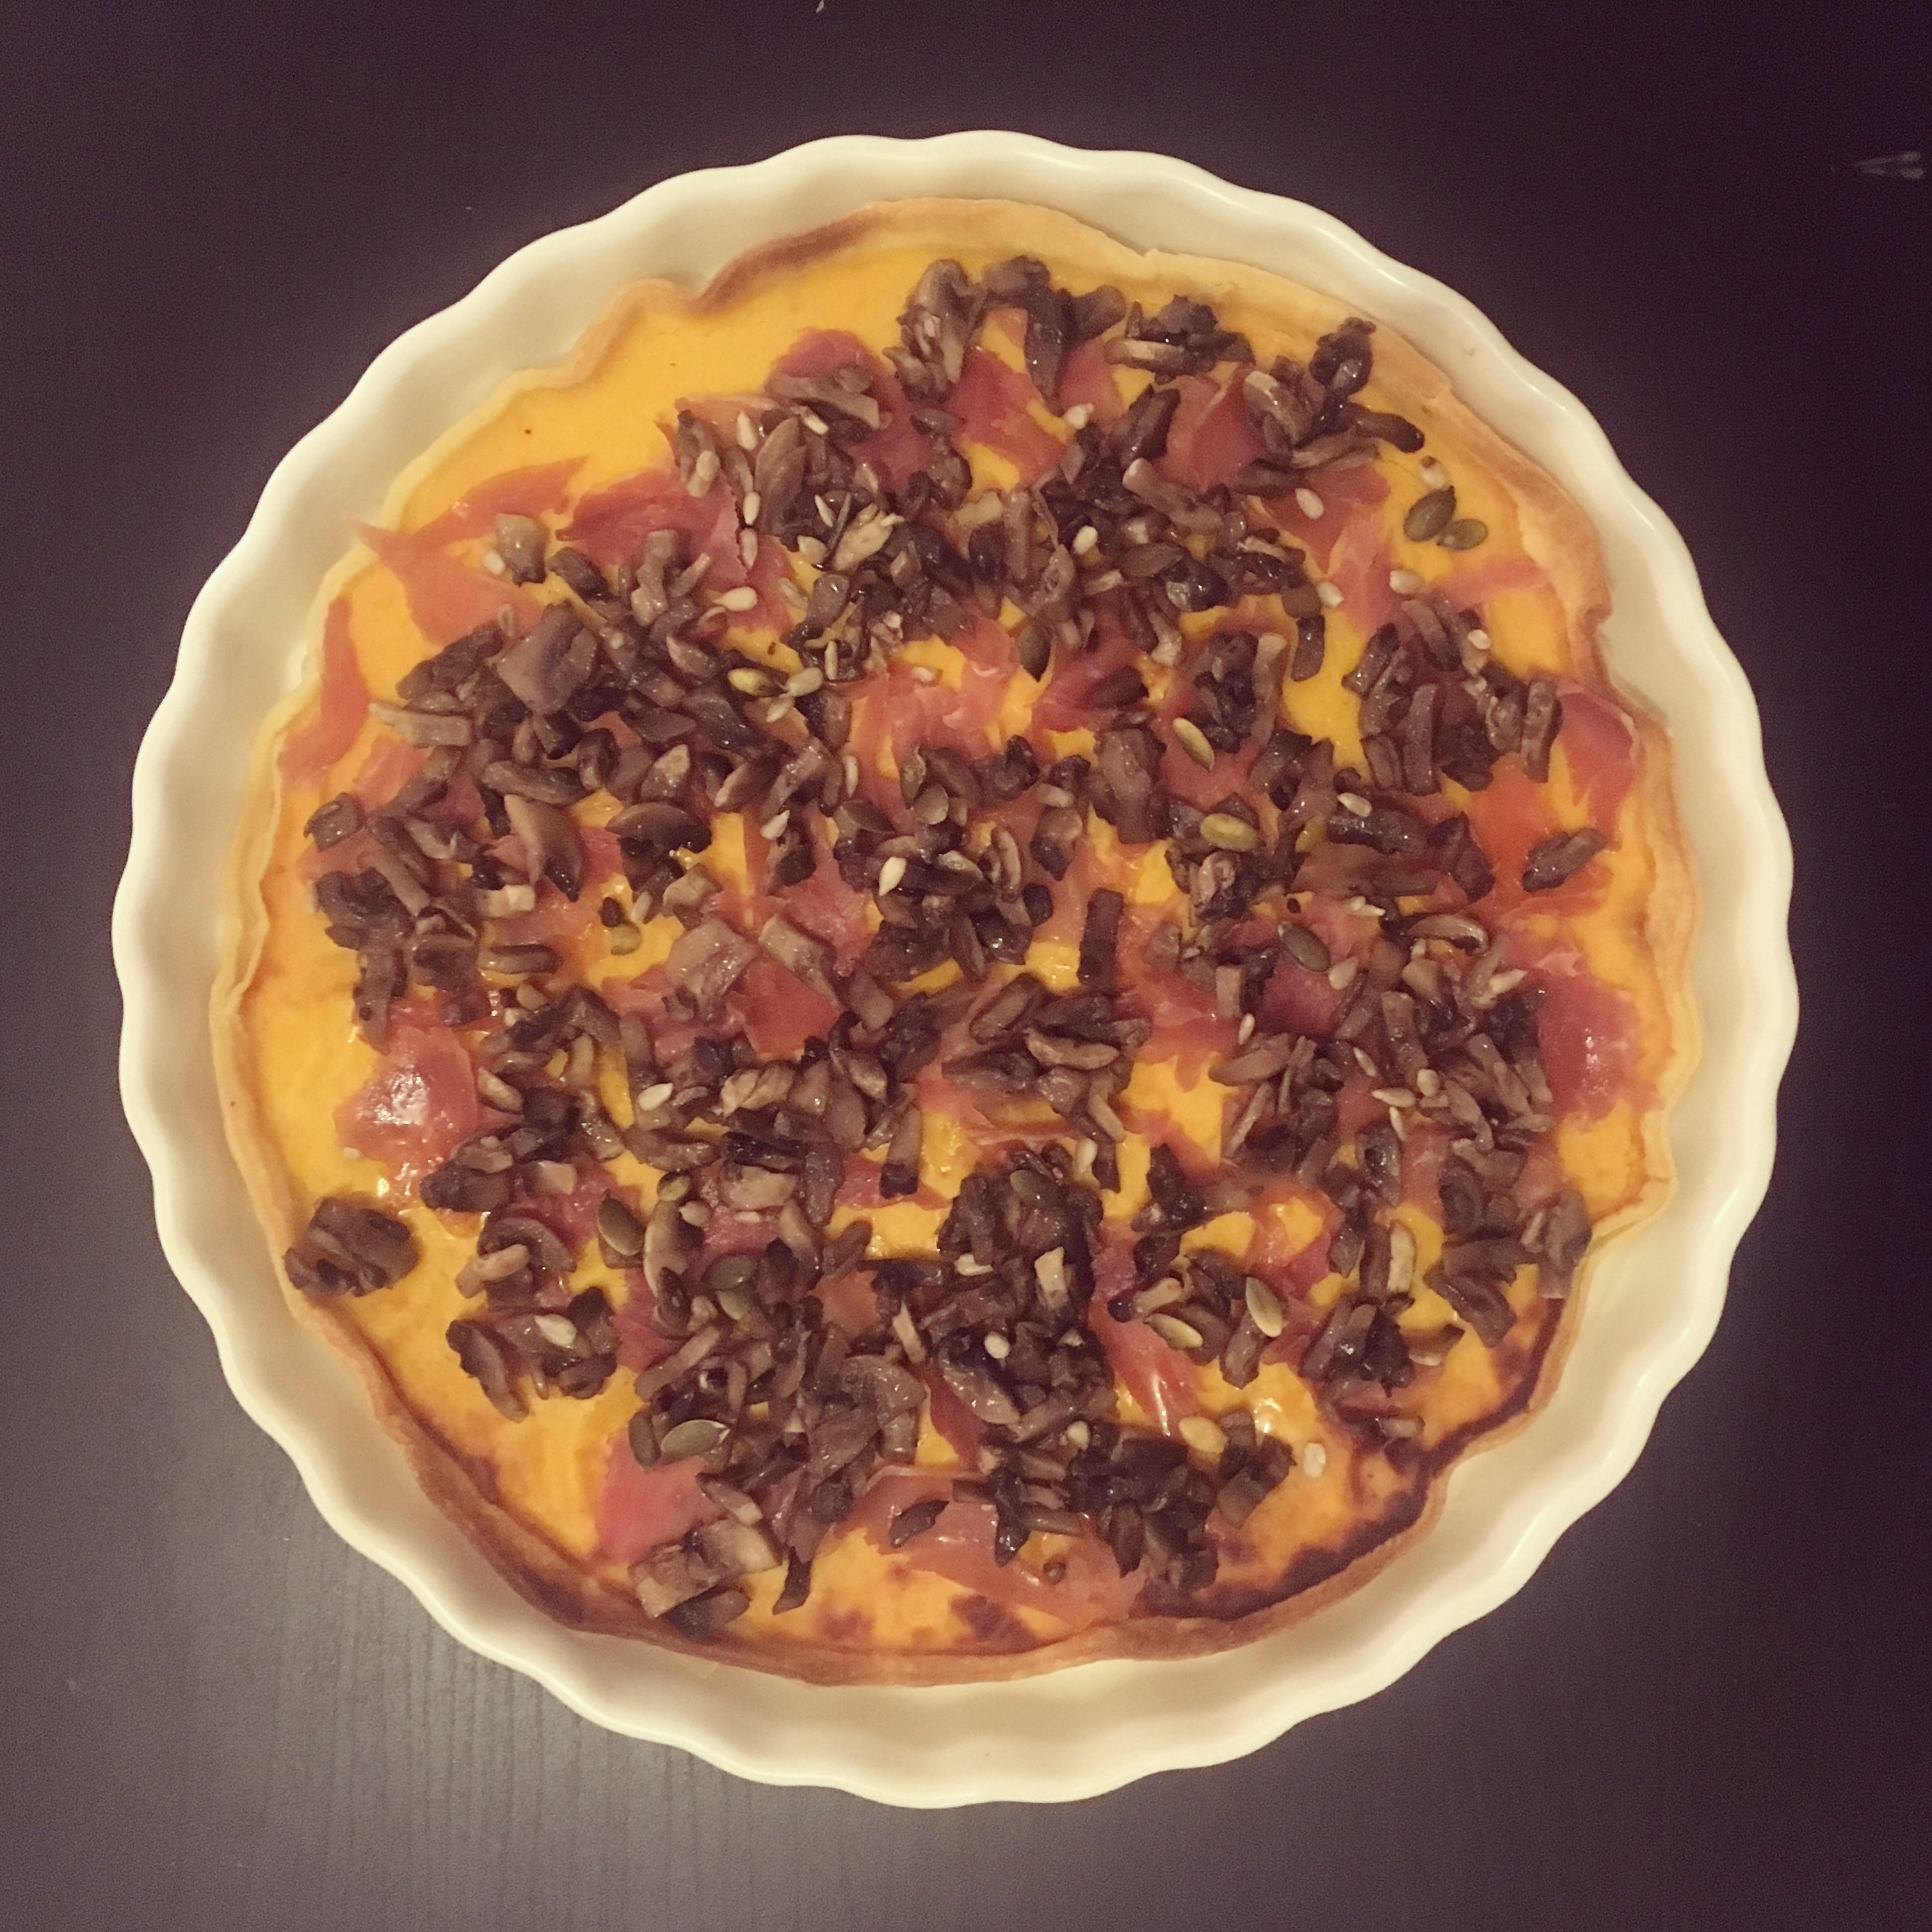 Tarte au potiron, champignons, jambon cru